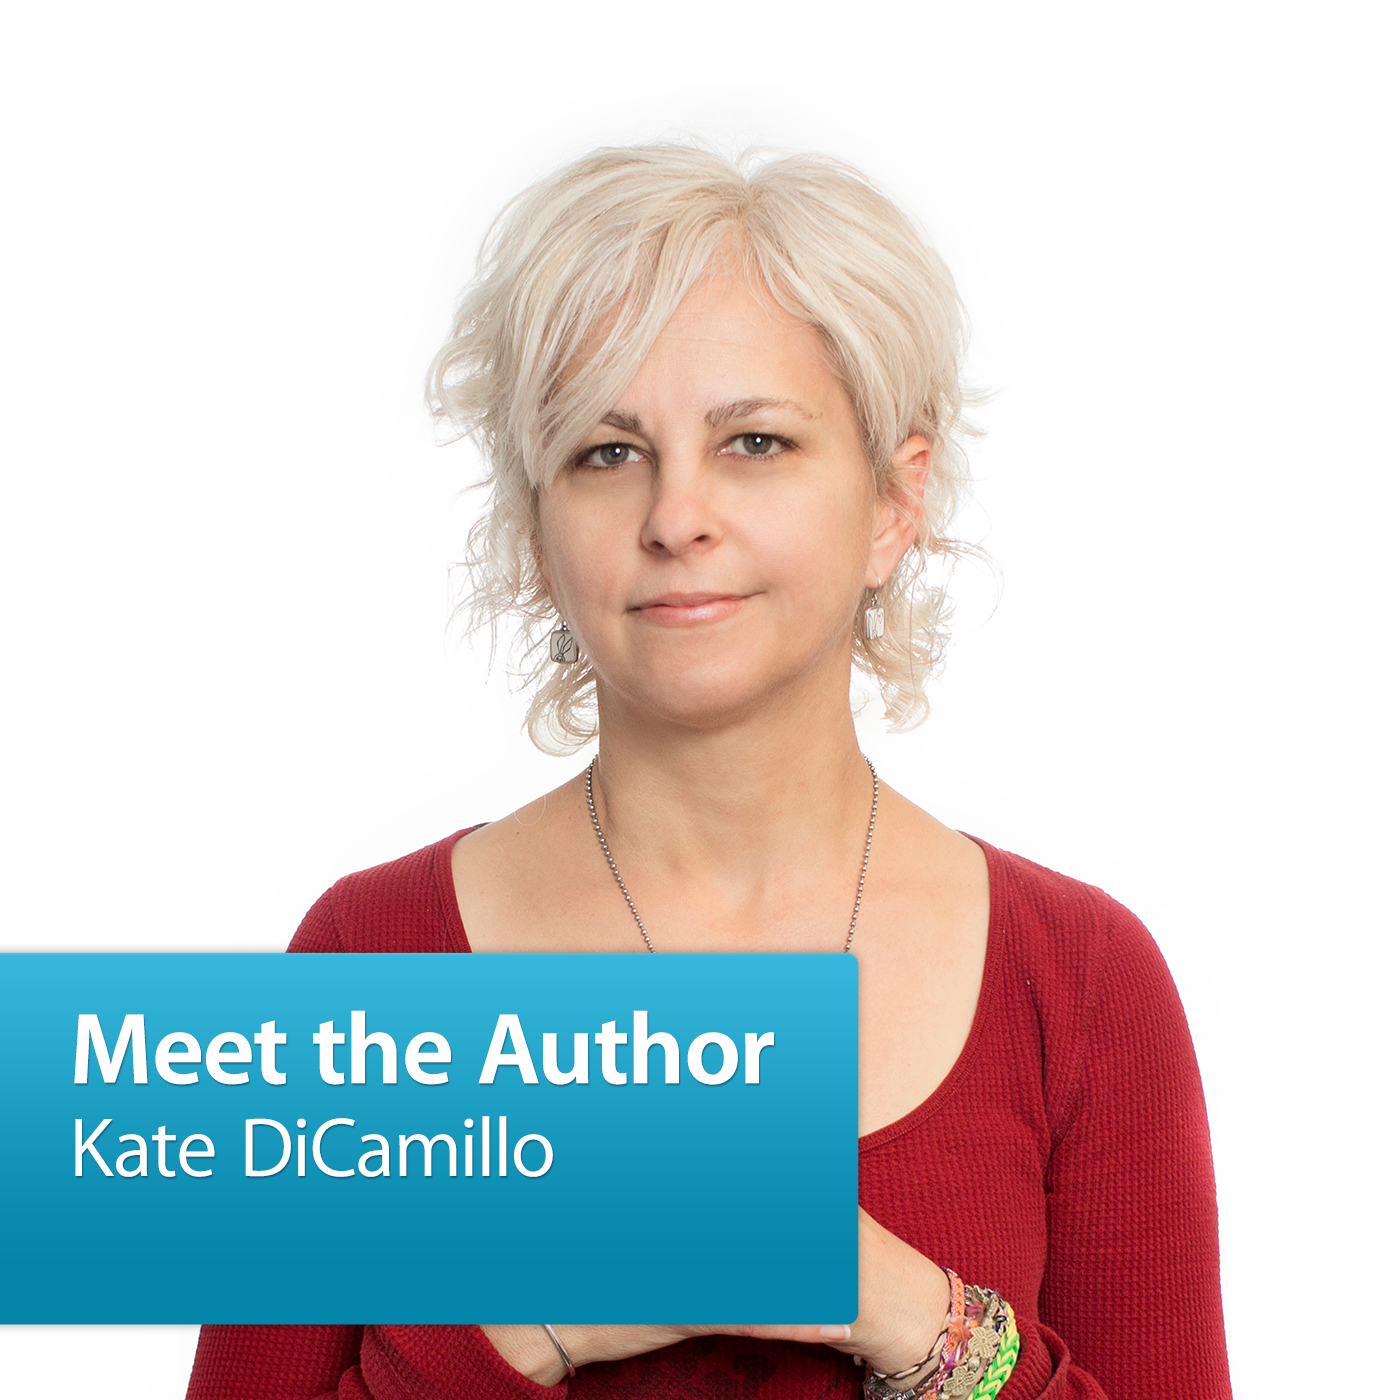 Kate DiCamillo: Meet the Author